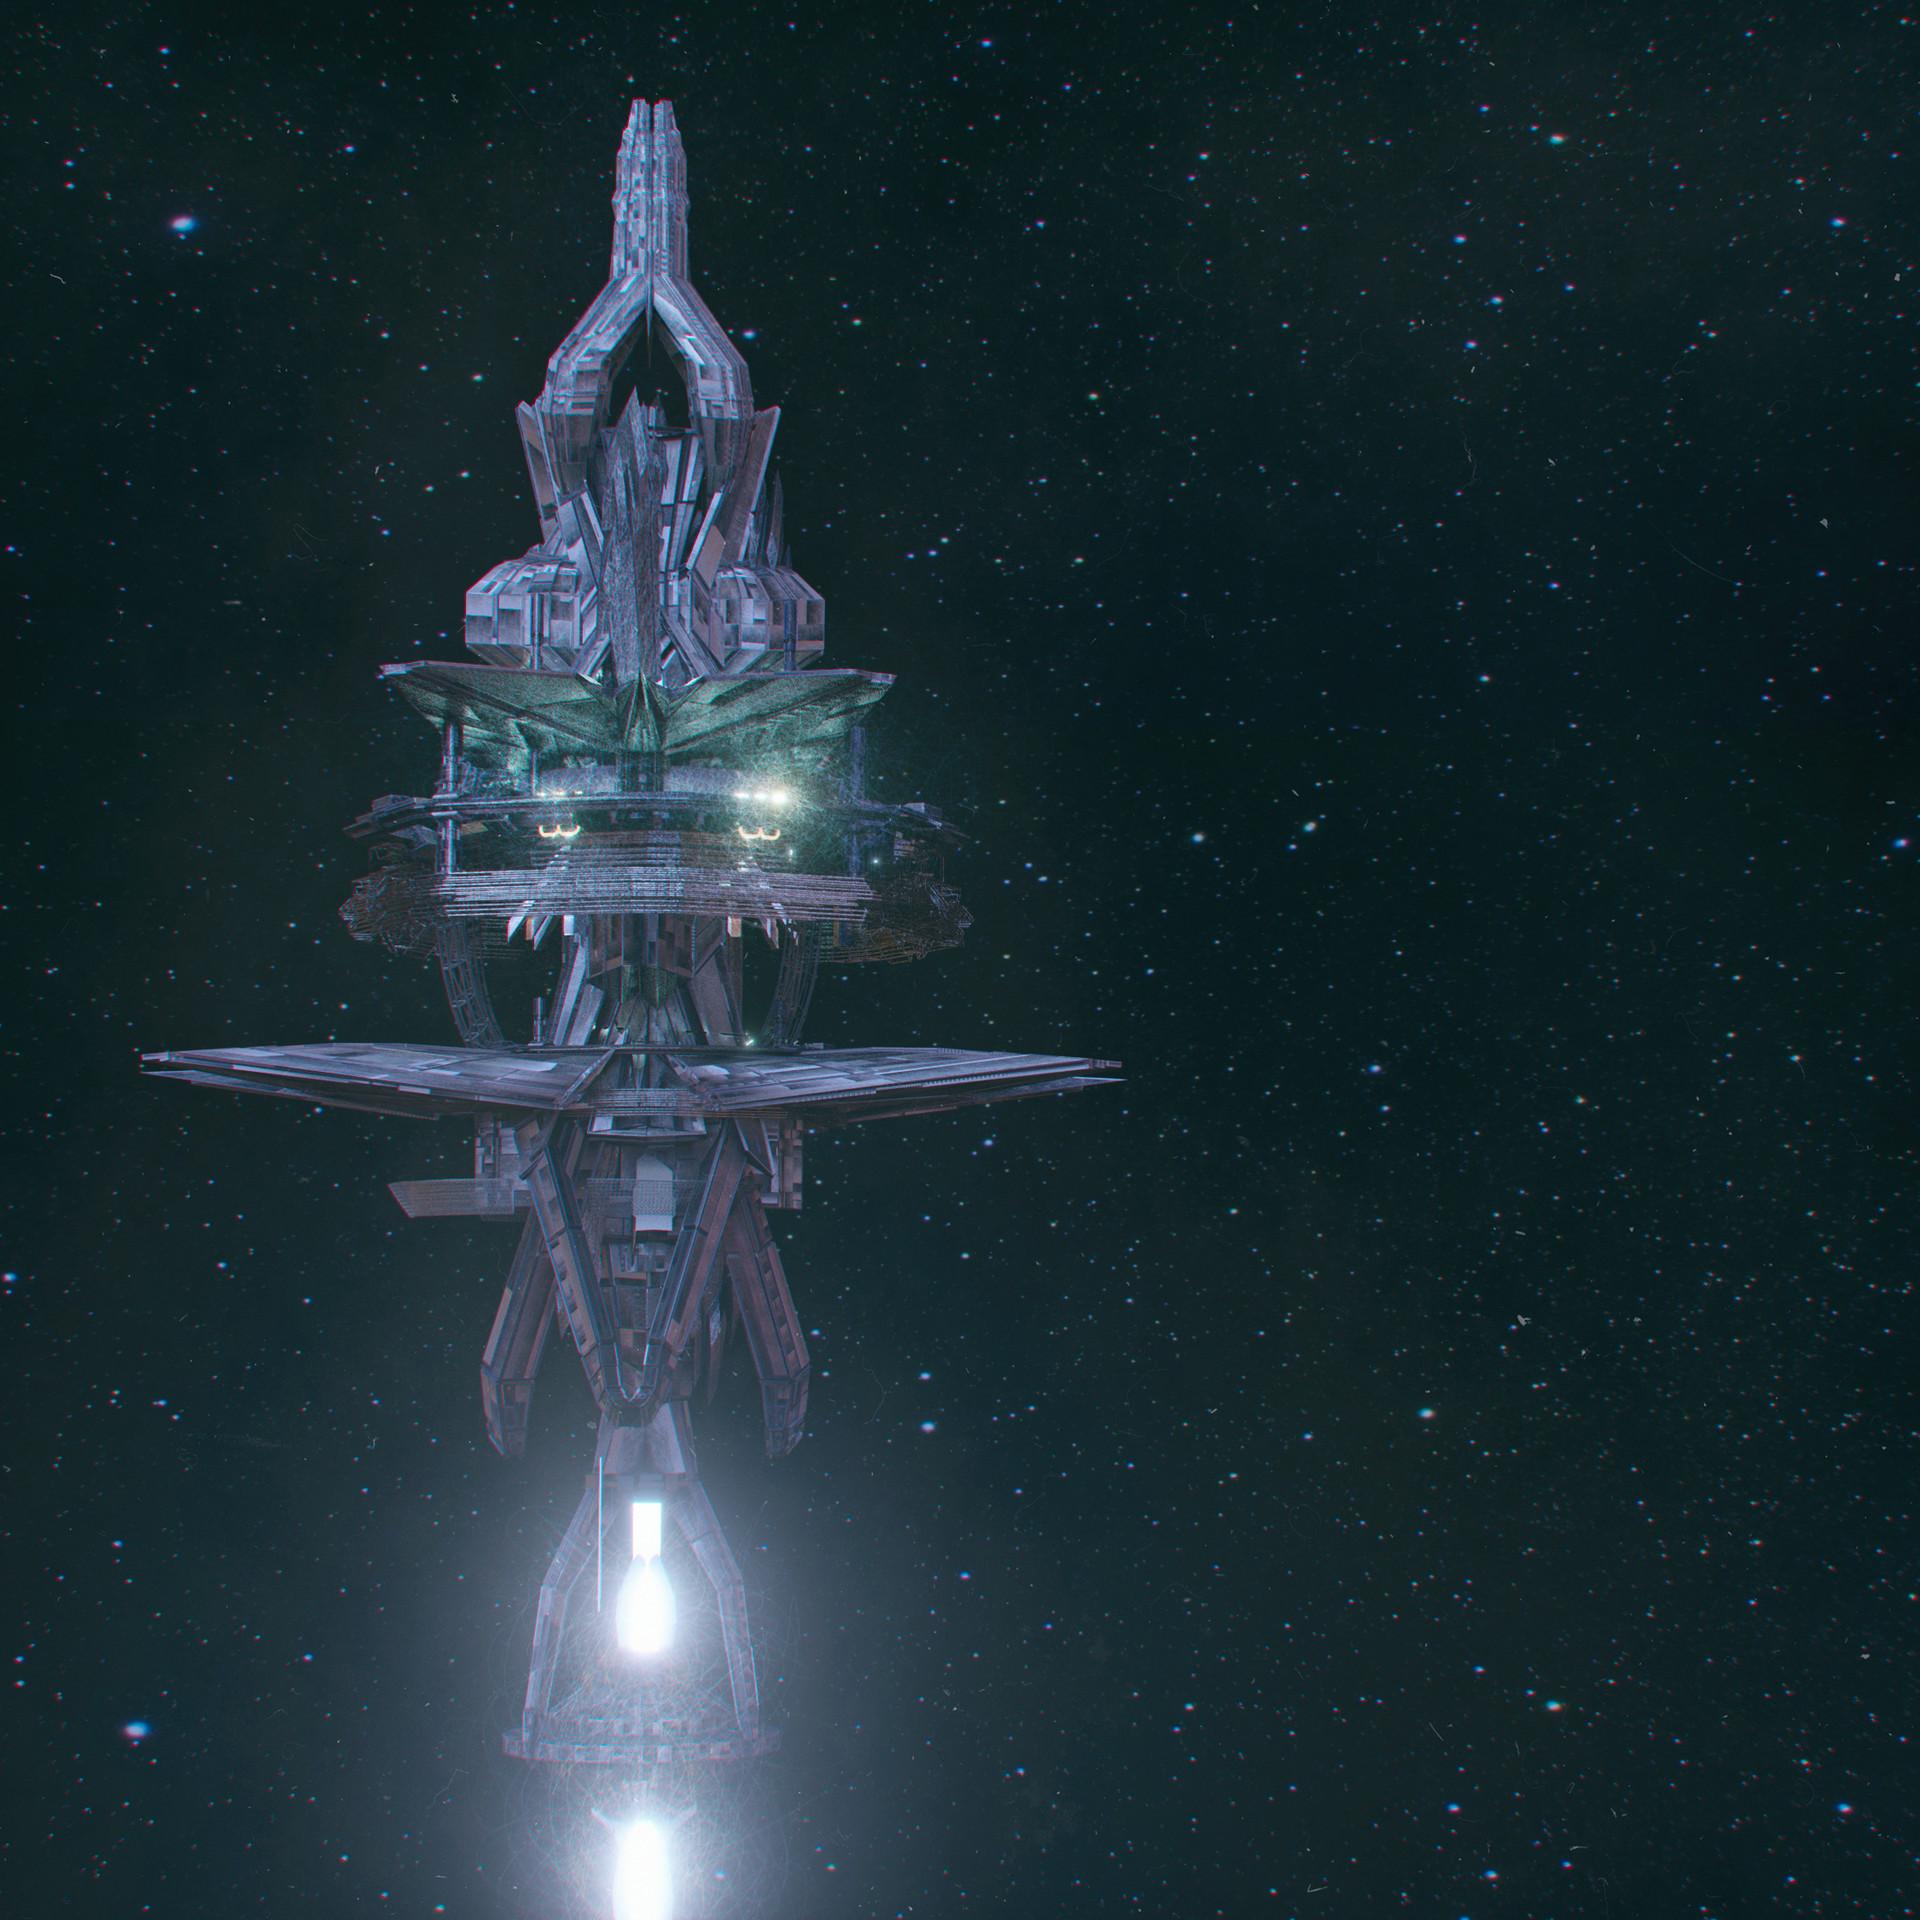 Kresimir jelusic robob3ar 168 250316 space station